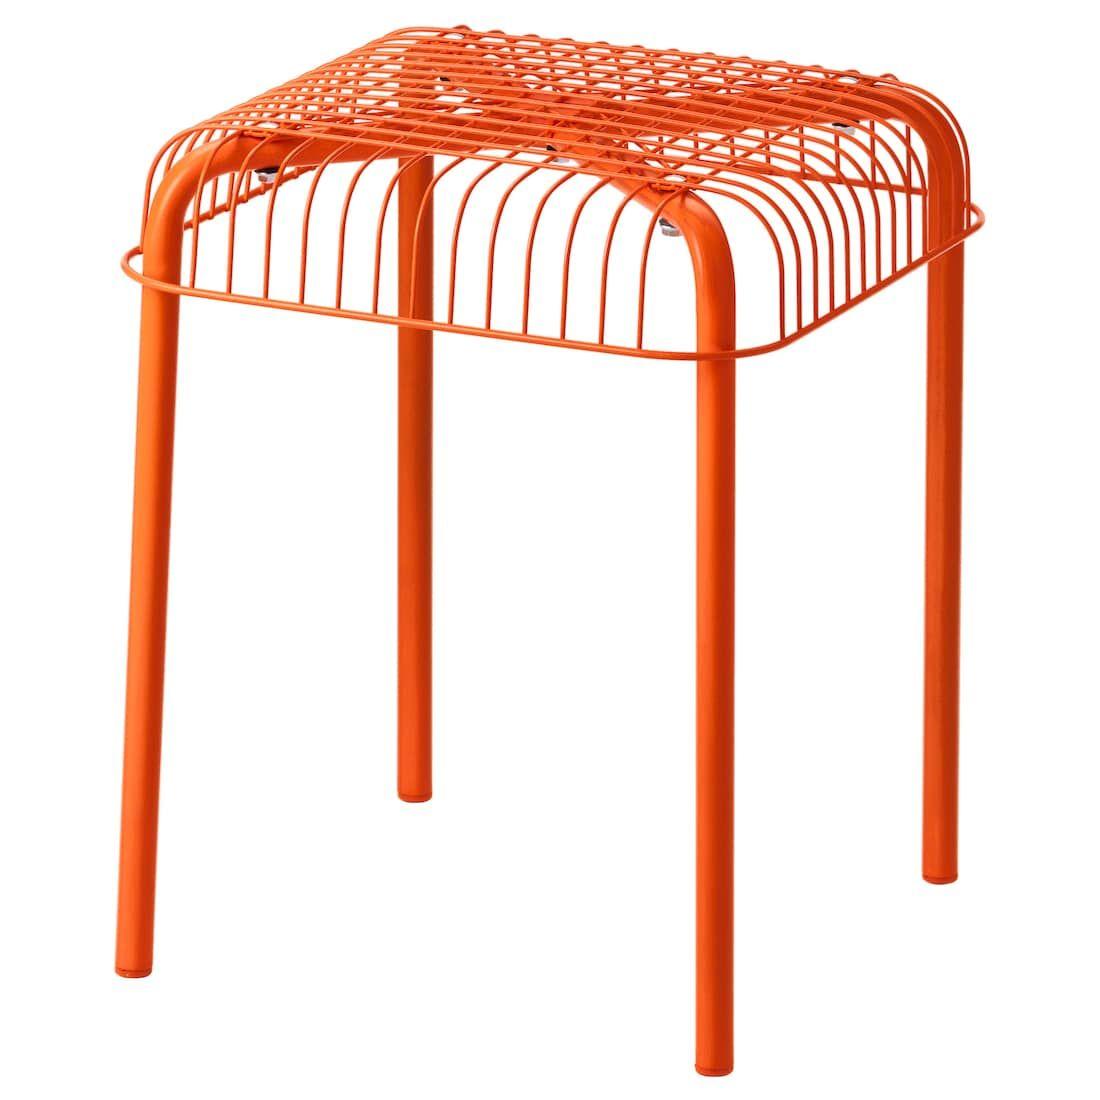 Vasteron Hocker Drinnen Draussen Orange Ikea Ikea Terrasse Gartenstuhle Hocker